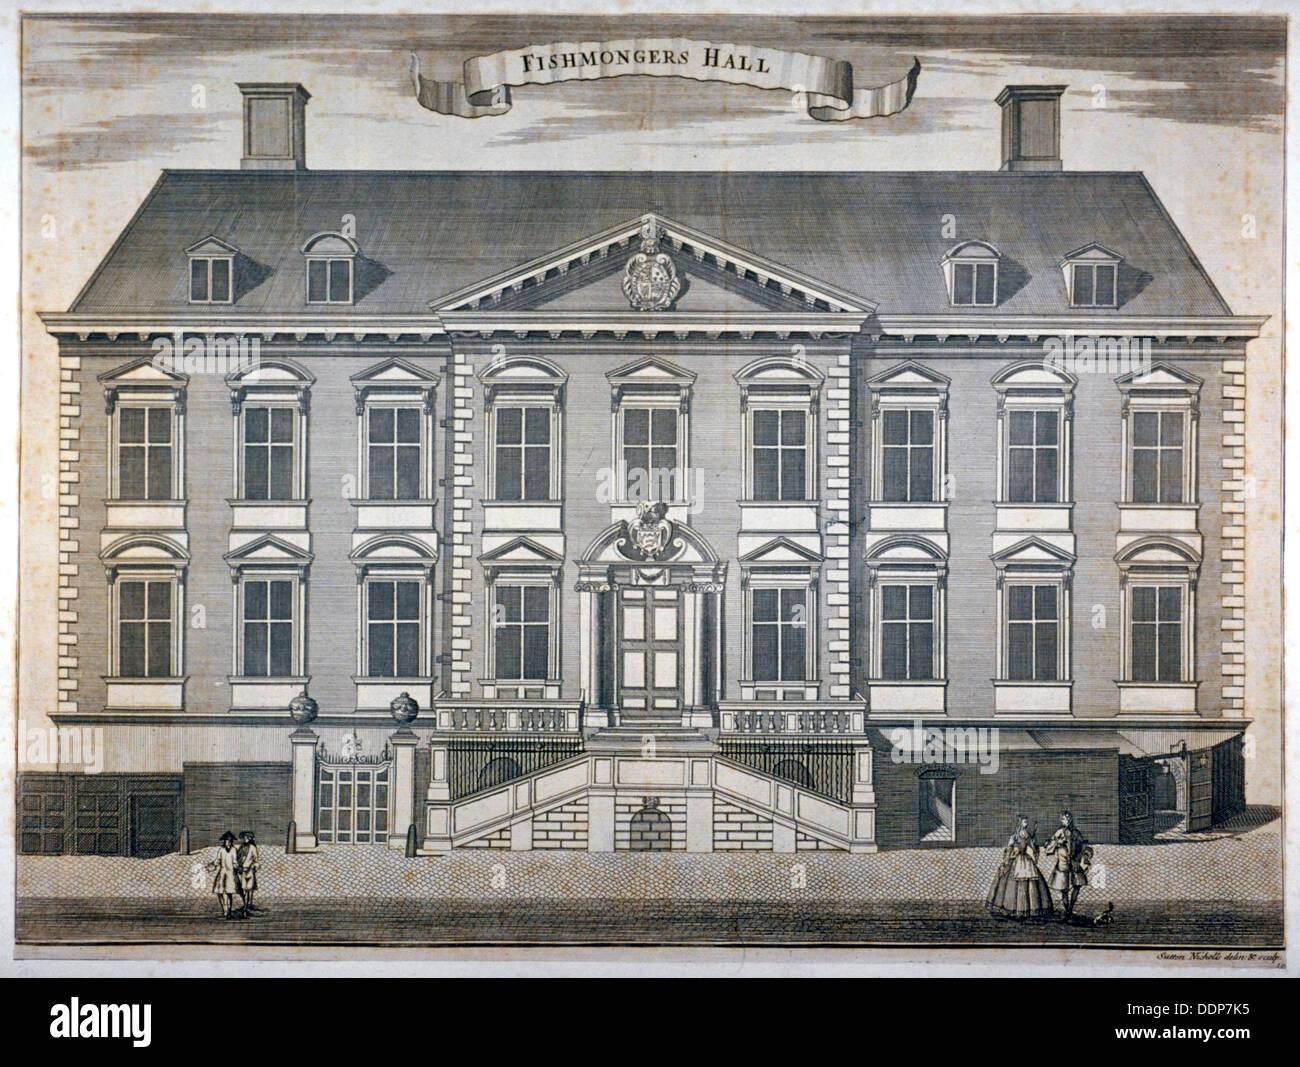 Fishmongers' Hall, City of London, c1750.                 Artist: Sutton Nicholls - Stock Image